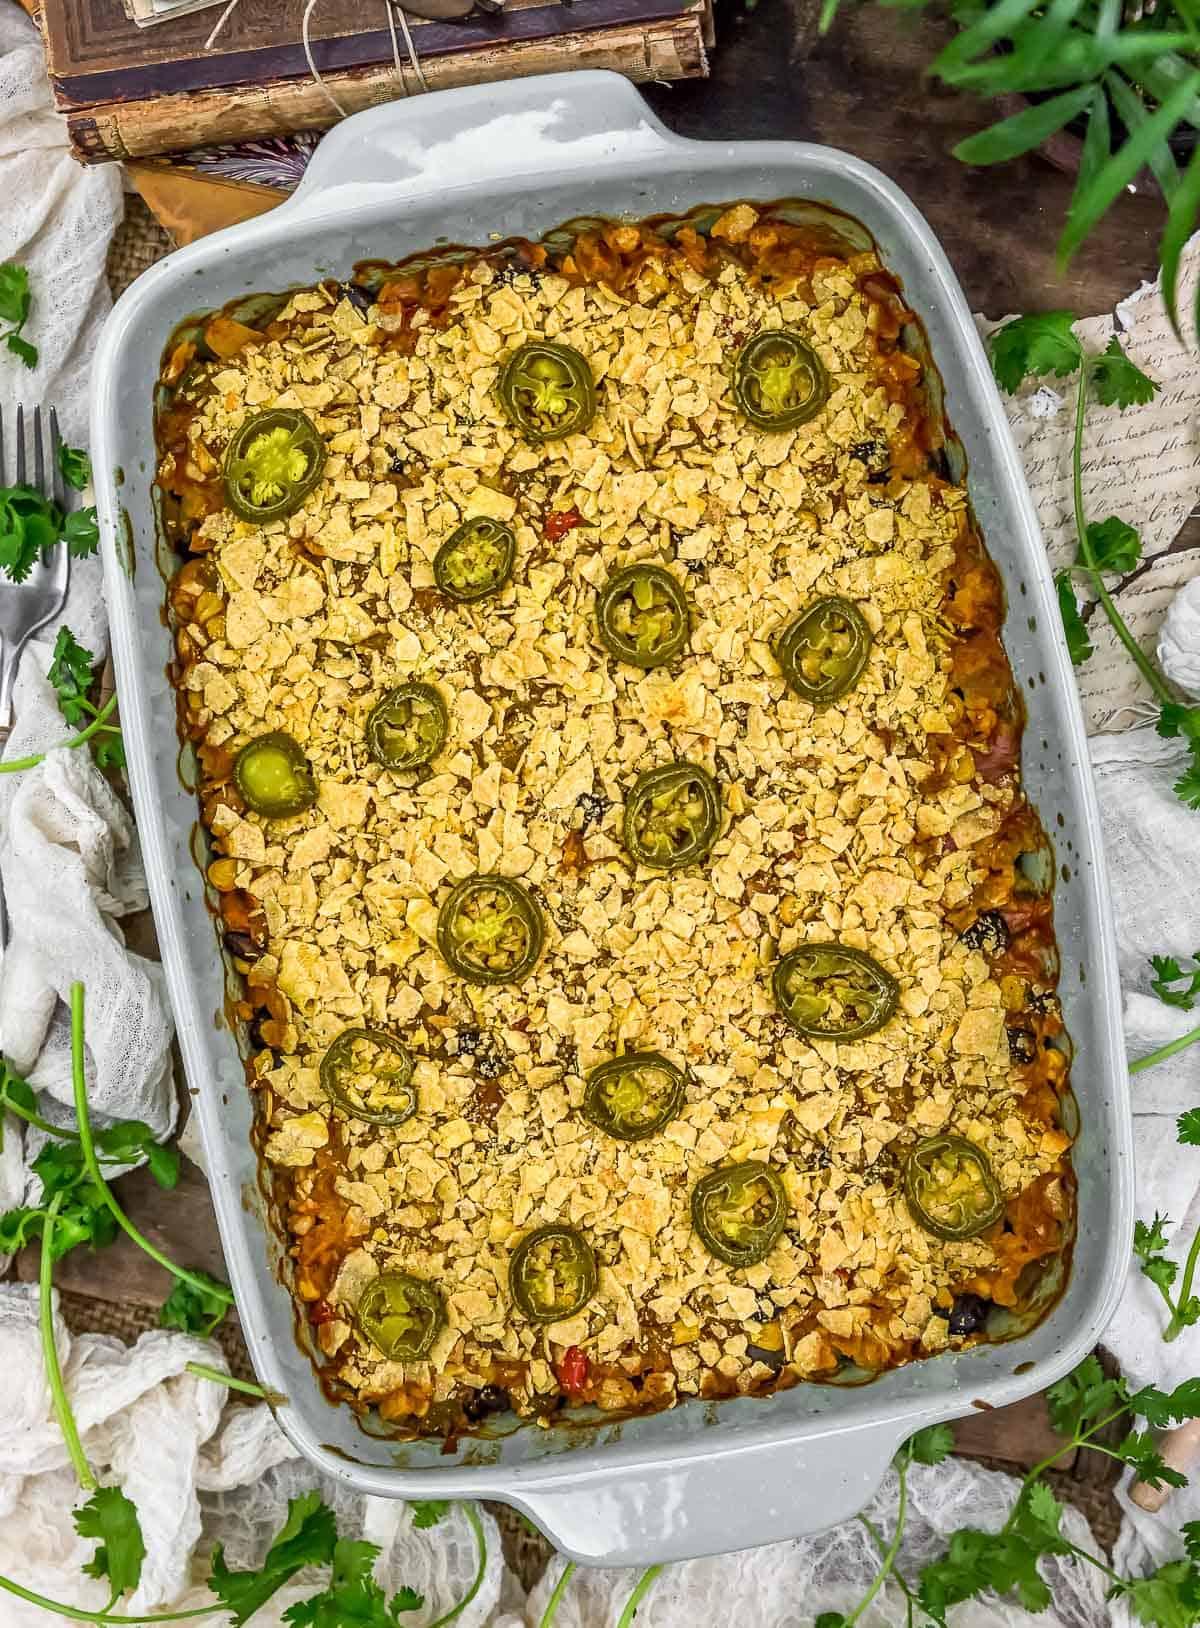 Vegan Tex-Mex Cabbage Casserole